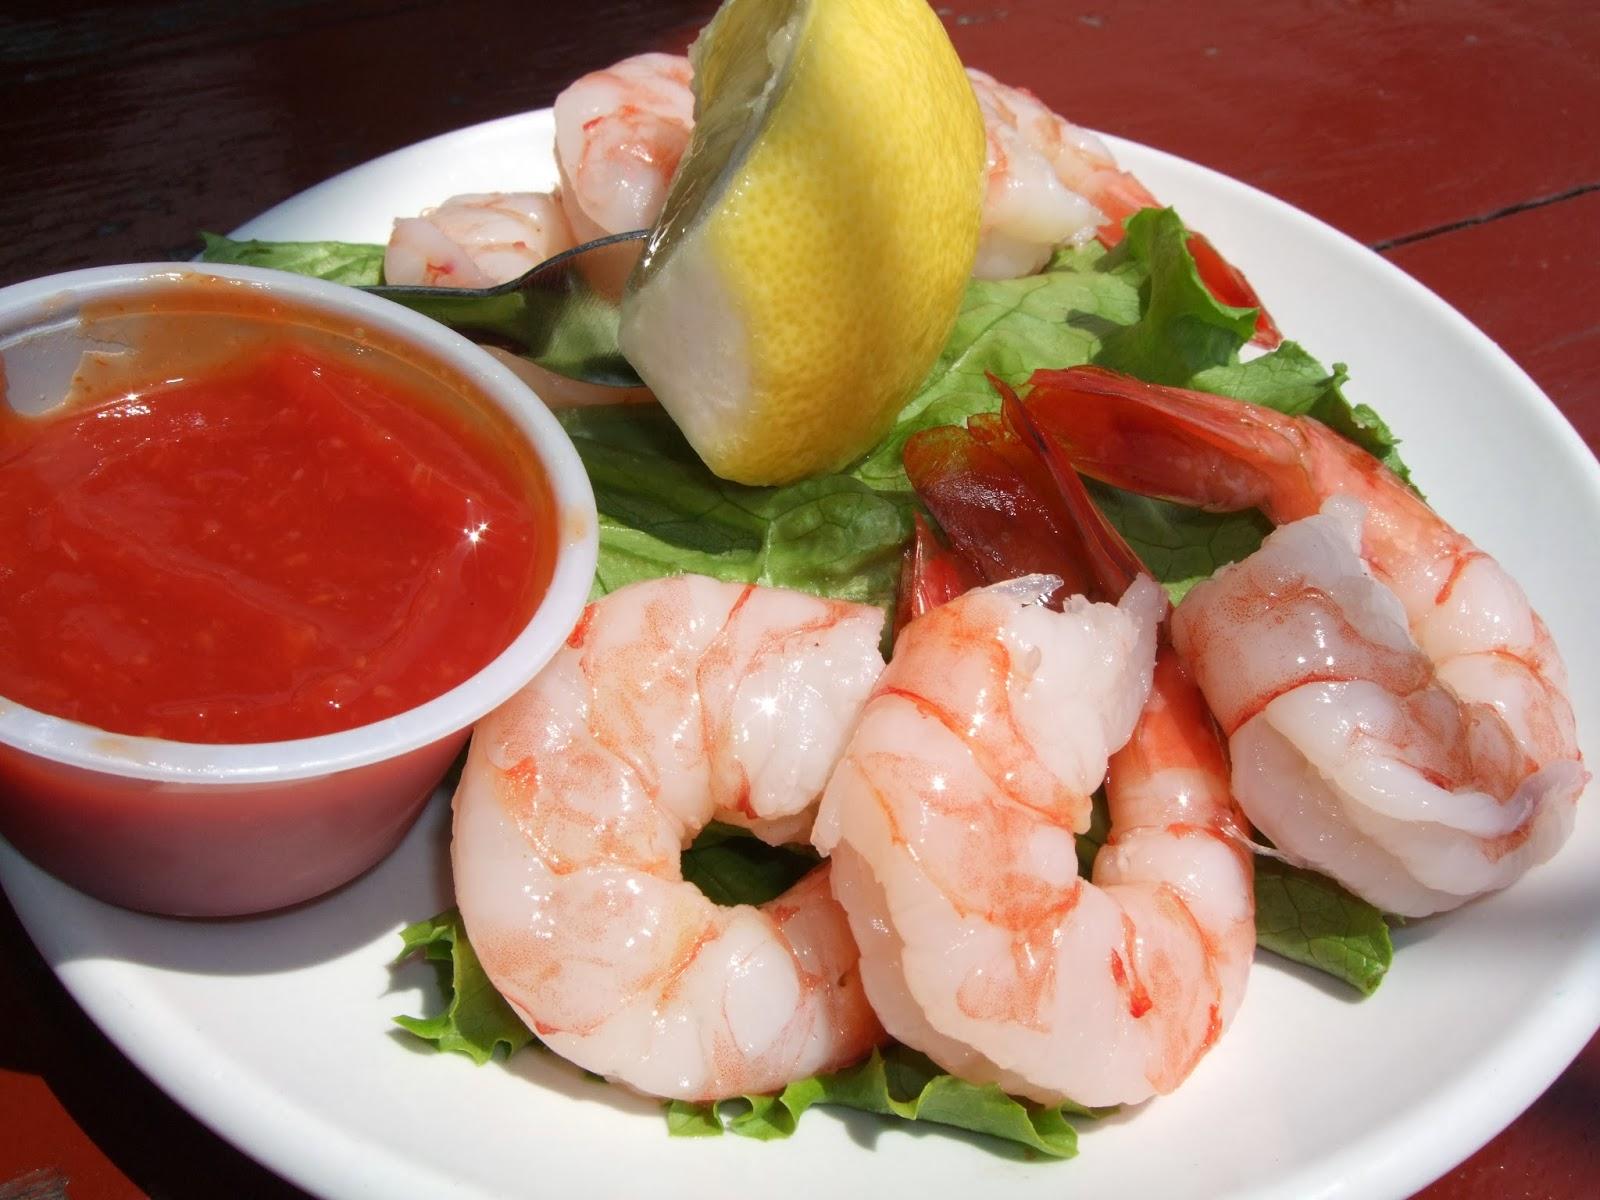 ... Year's Day Recipe For Diabetes: Shrimp Cocktail – Diabetes Recipes